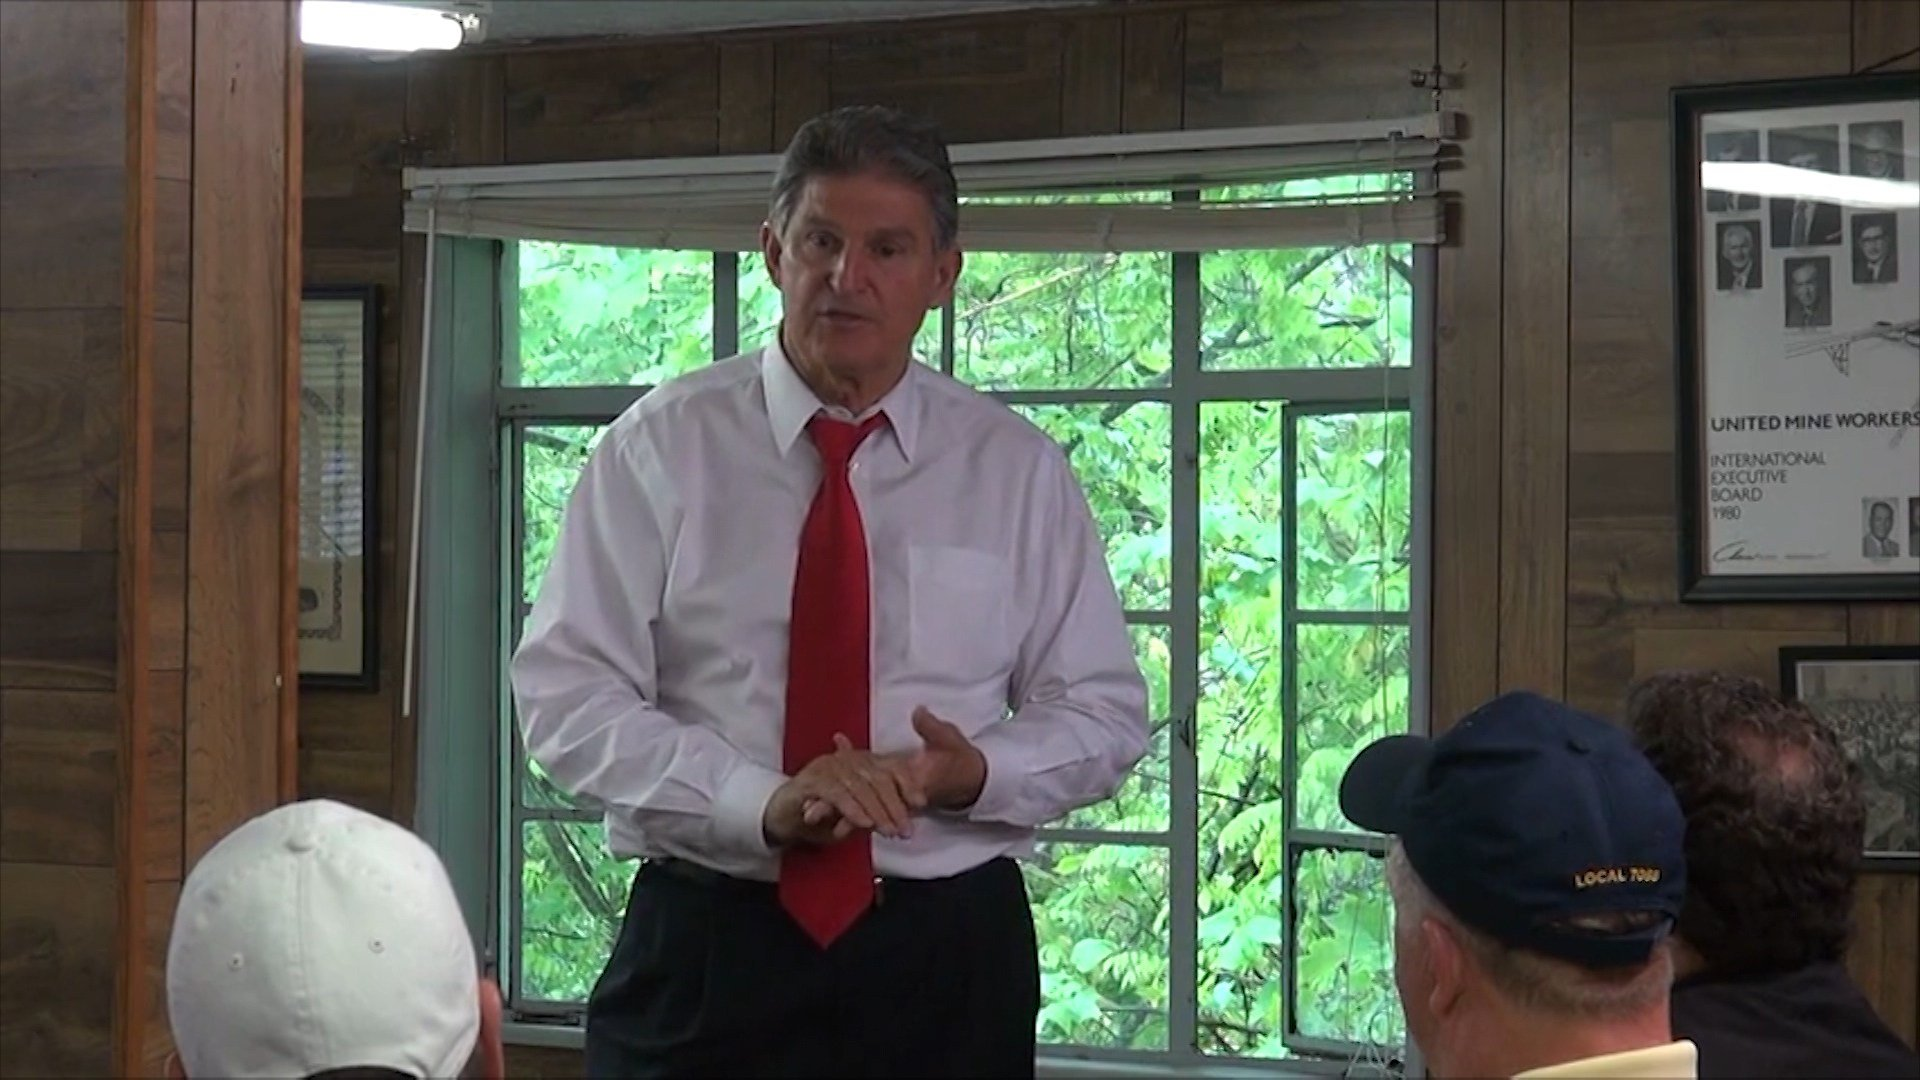 Senator Joe Manchin (D) is seeking re-election.